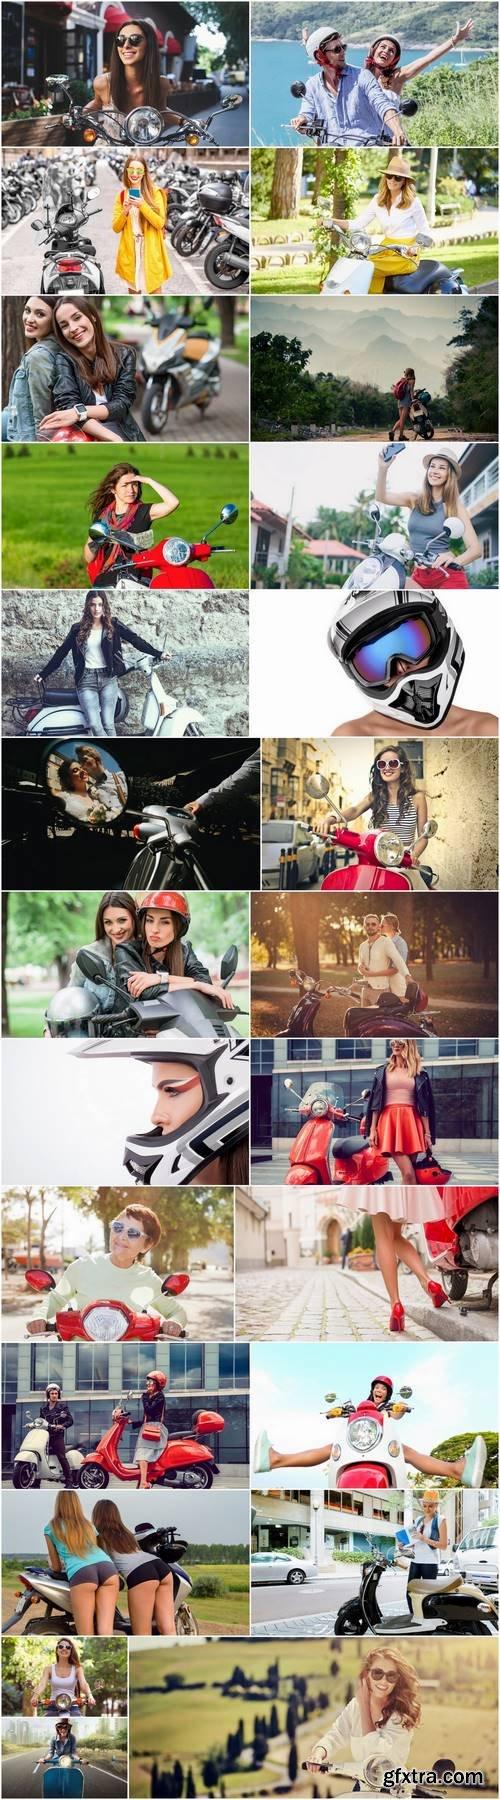 Motor scooter girl woman city urban style helmet 25 HQ Jpeg